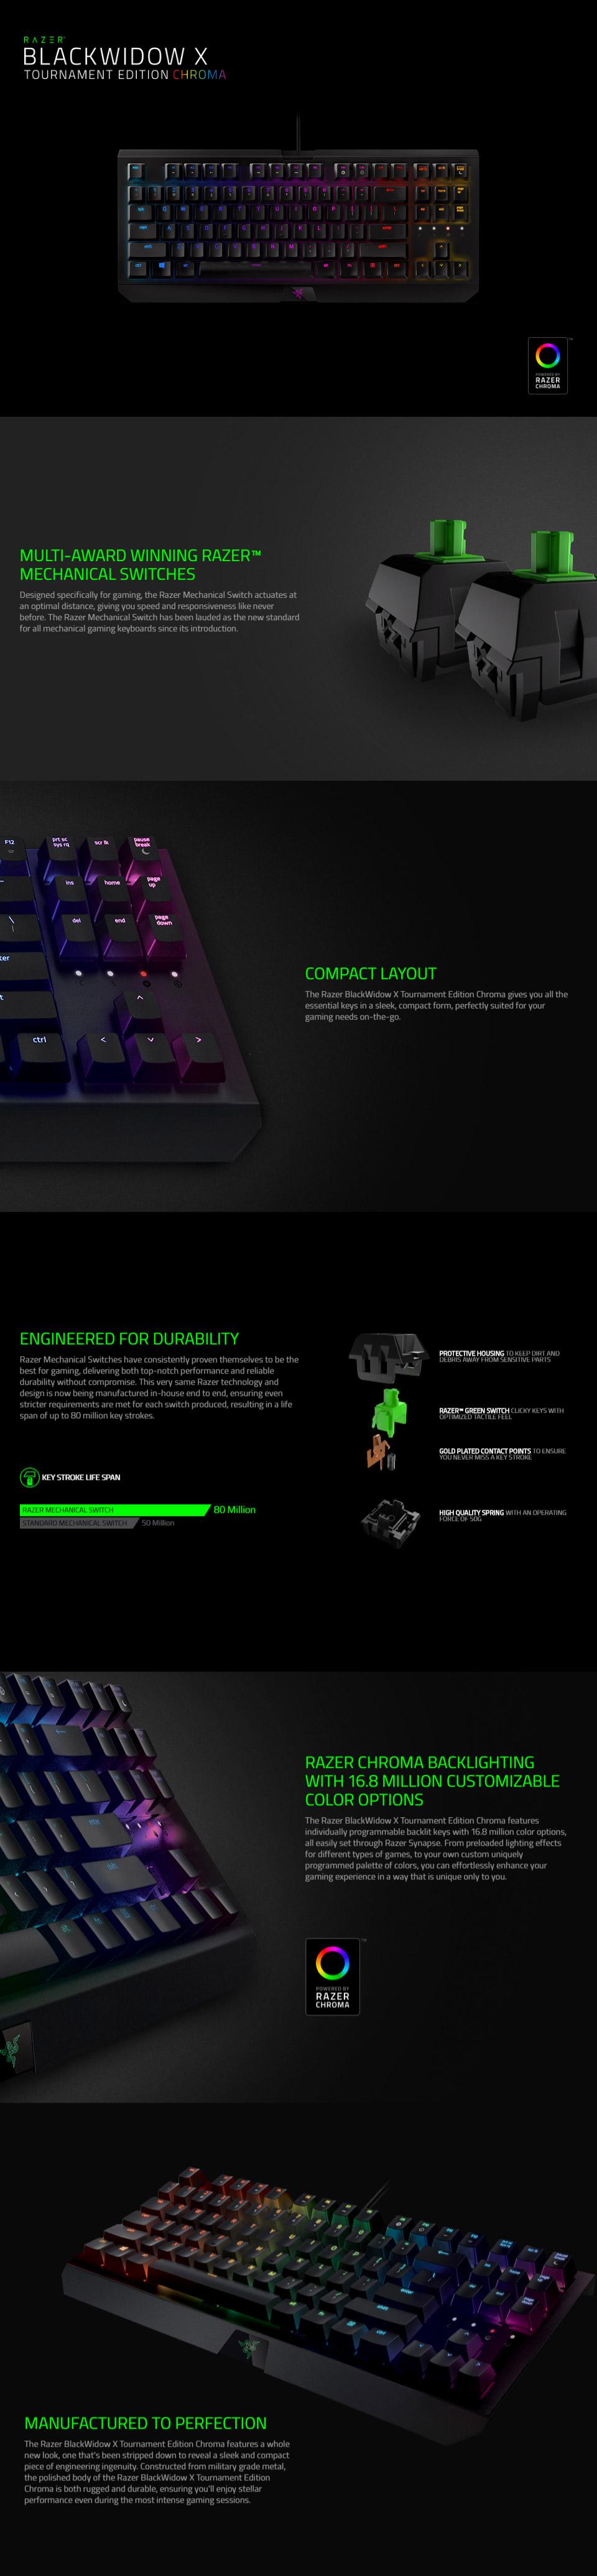 Razer Blackwidow X Tournament Chroma Rgb Mechanical Keyboard Rz03 Te An Error Occurred